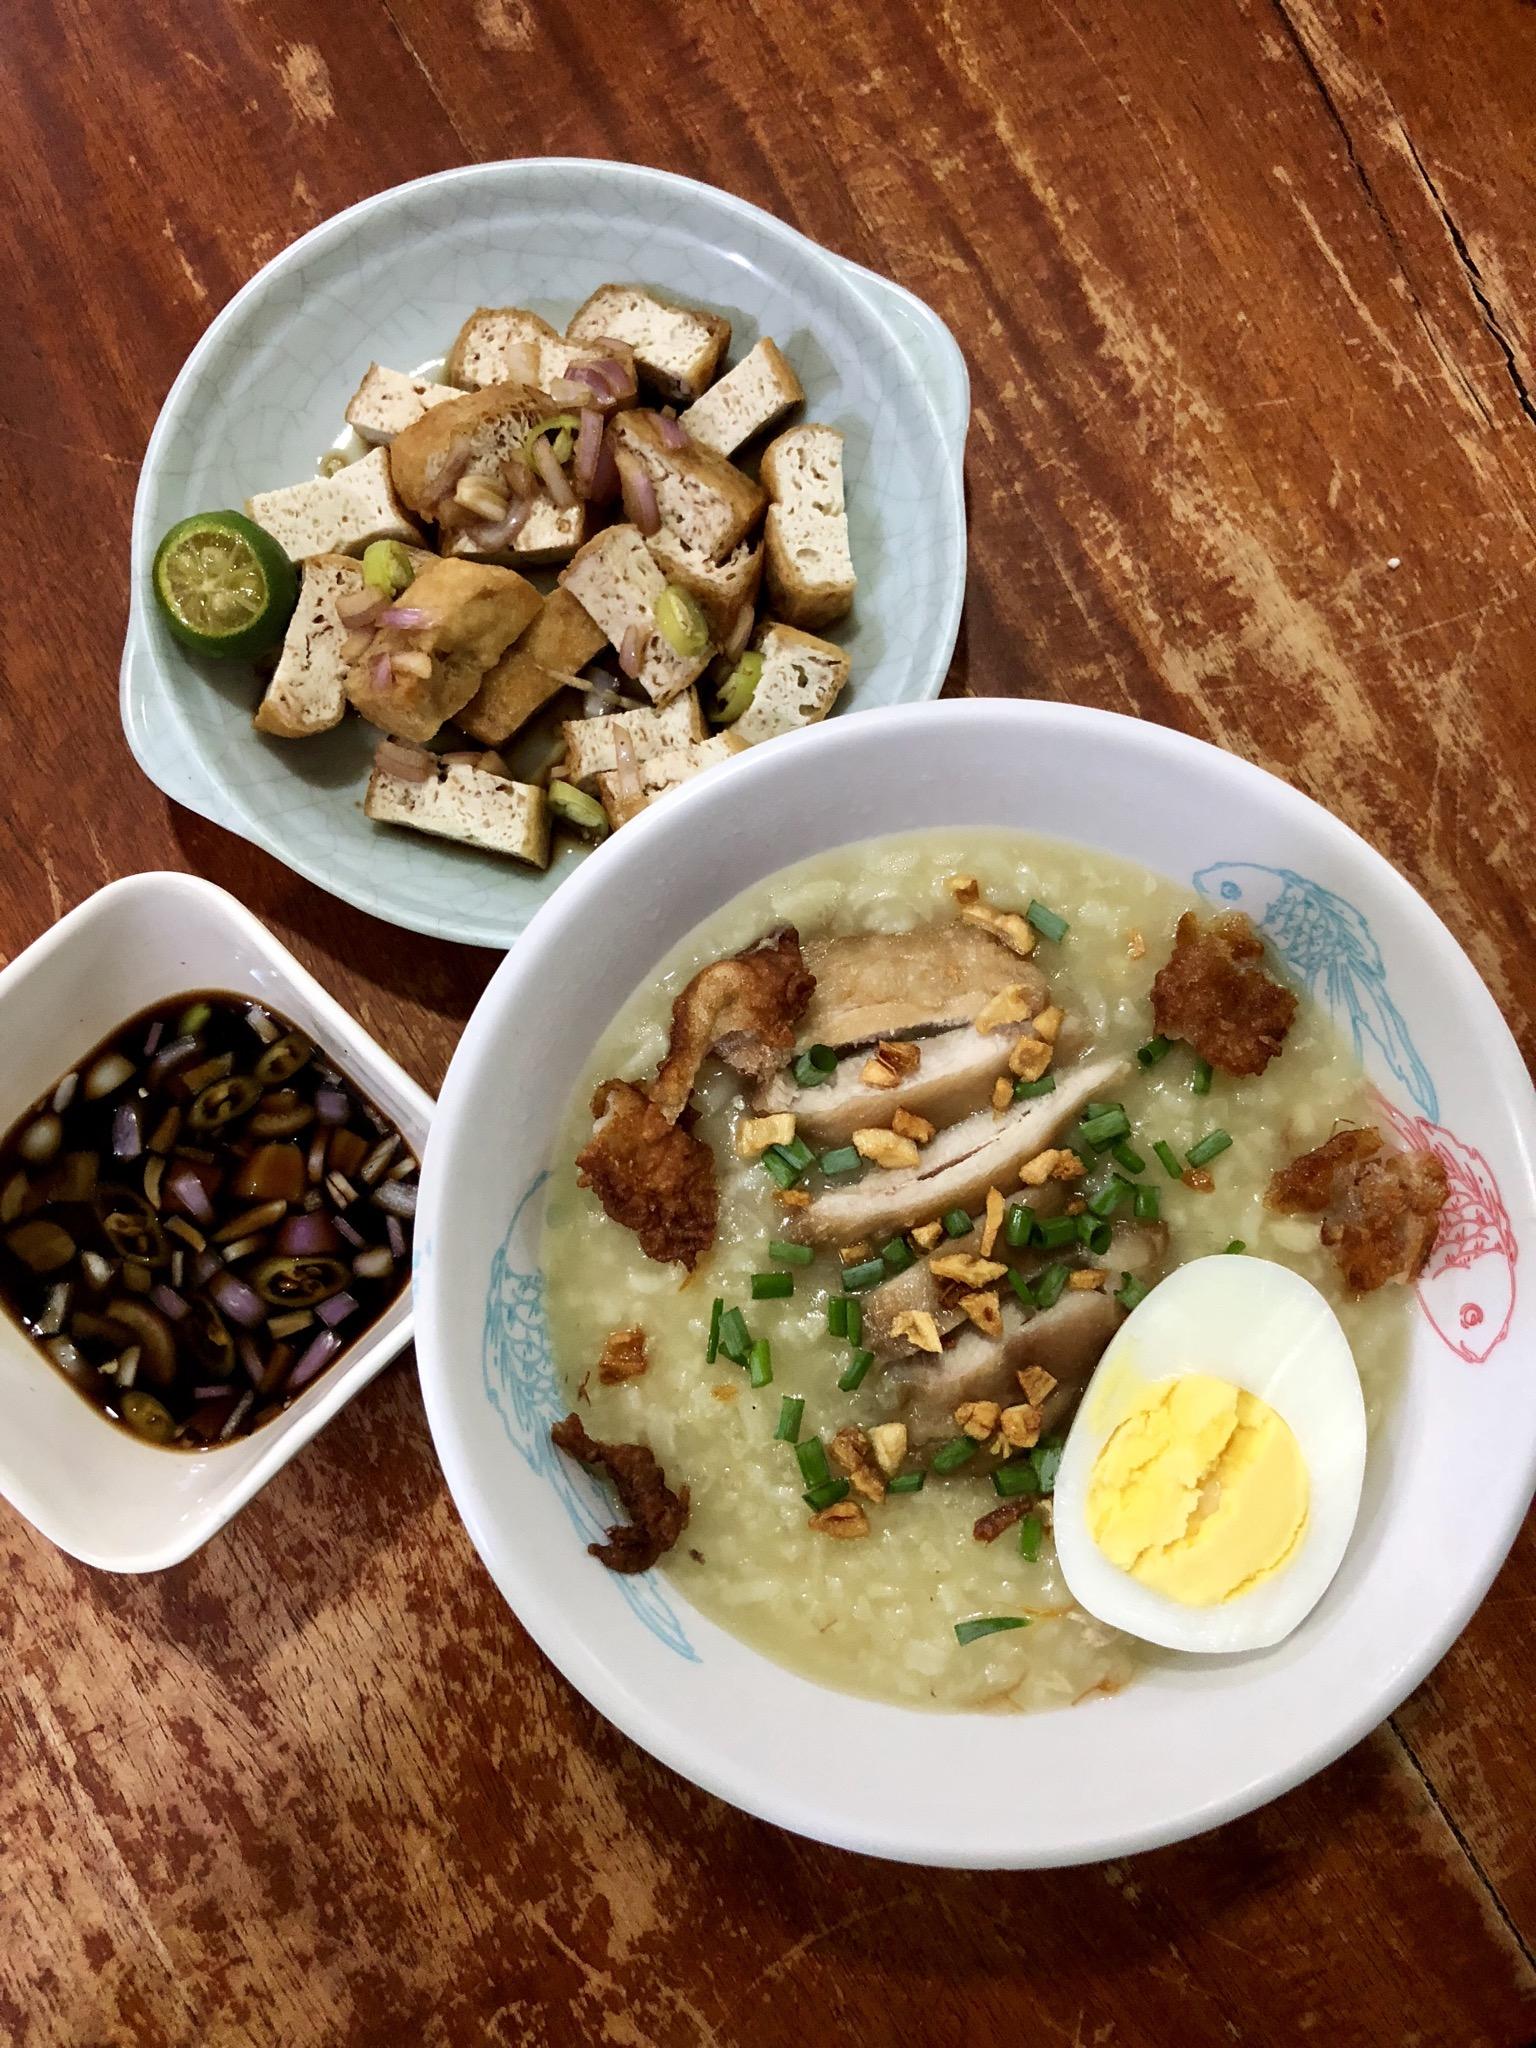 Chicken Arroz Caldo (Chicken Rice Porridge) Roxy Bautista